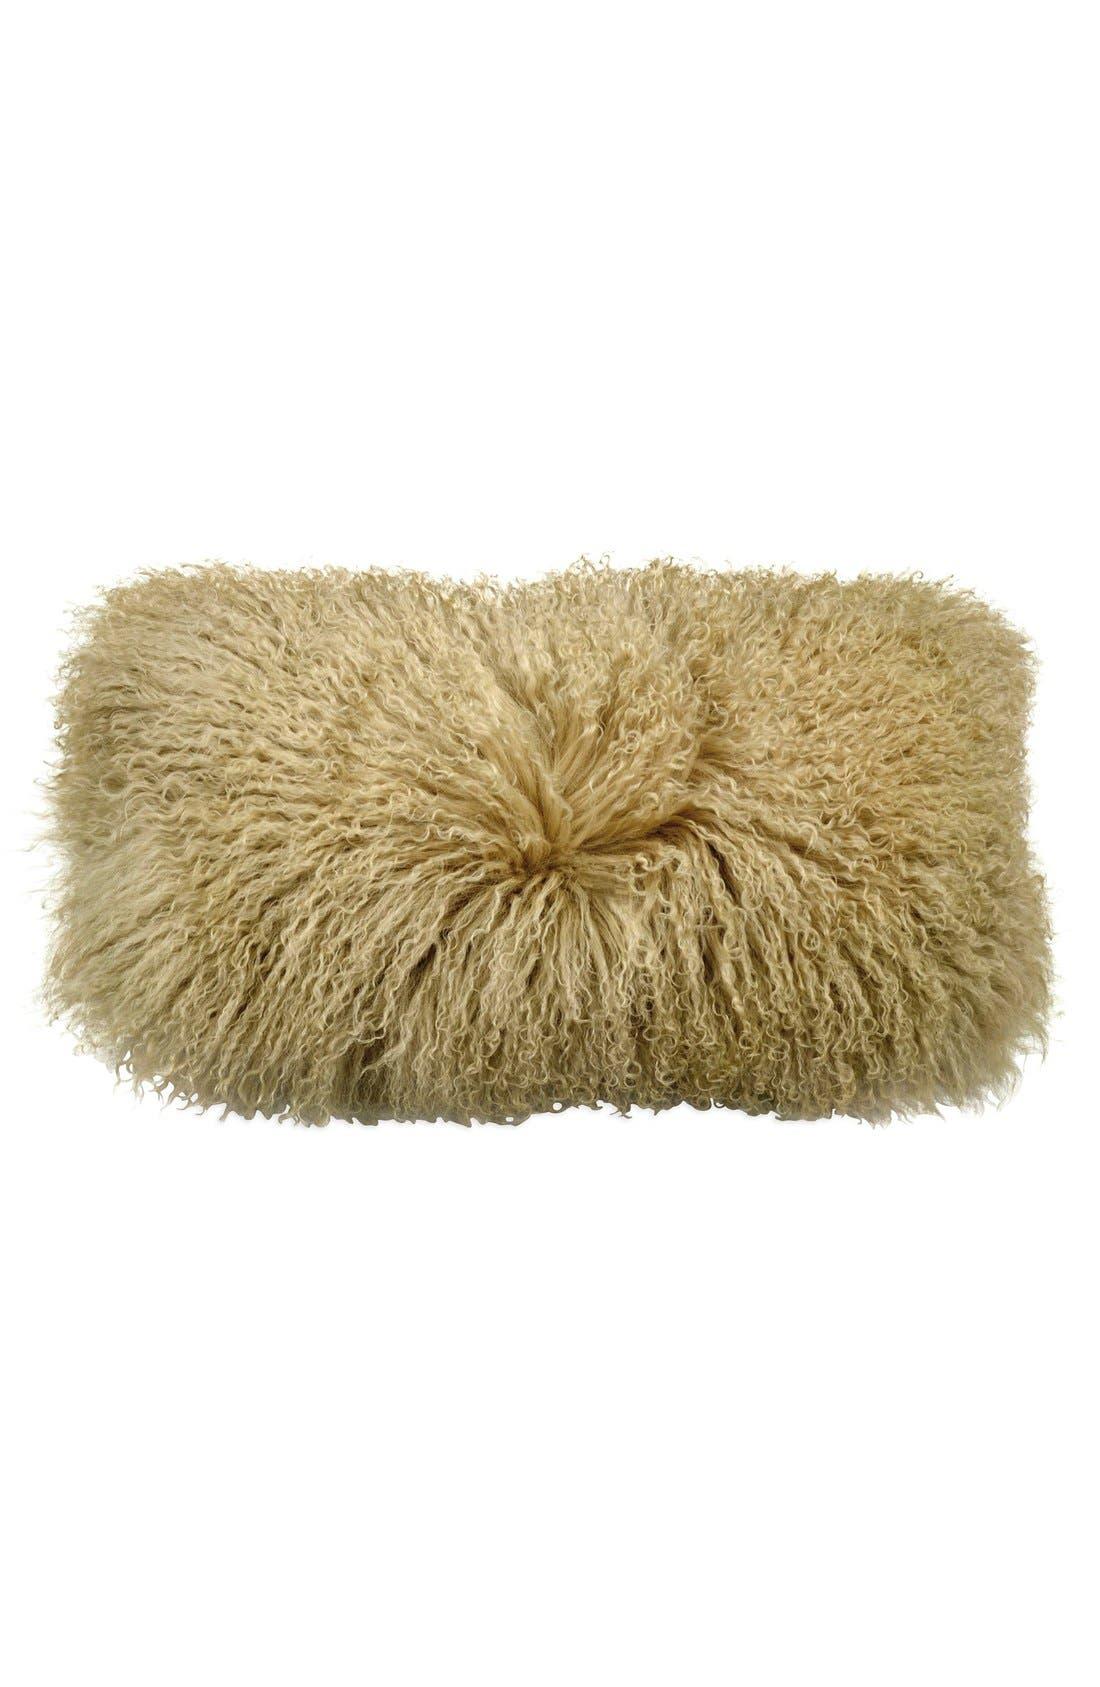 Flokati Genuine Shearling Pillow,                         Main,                         color, Gold Dust